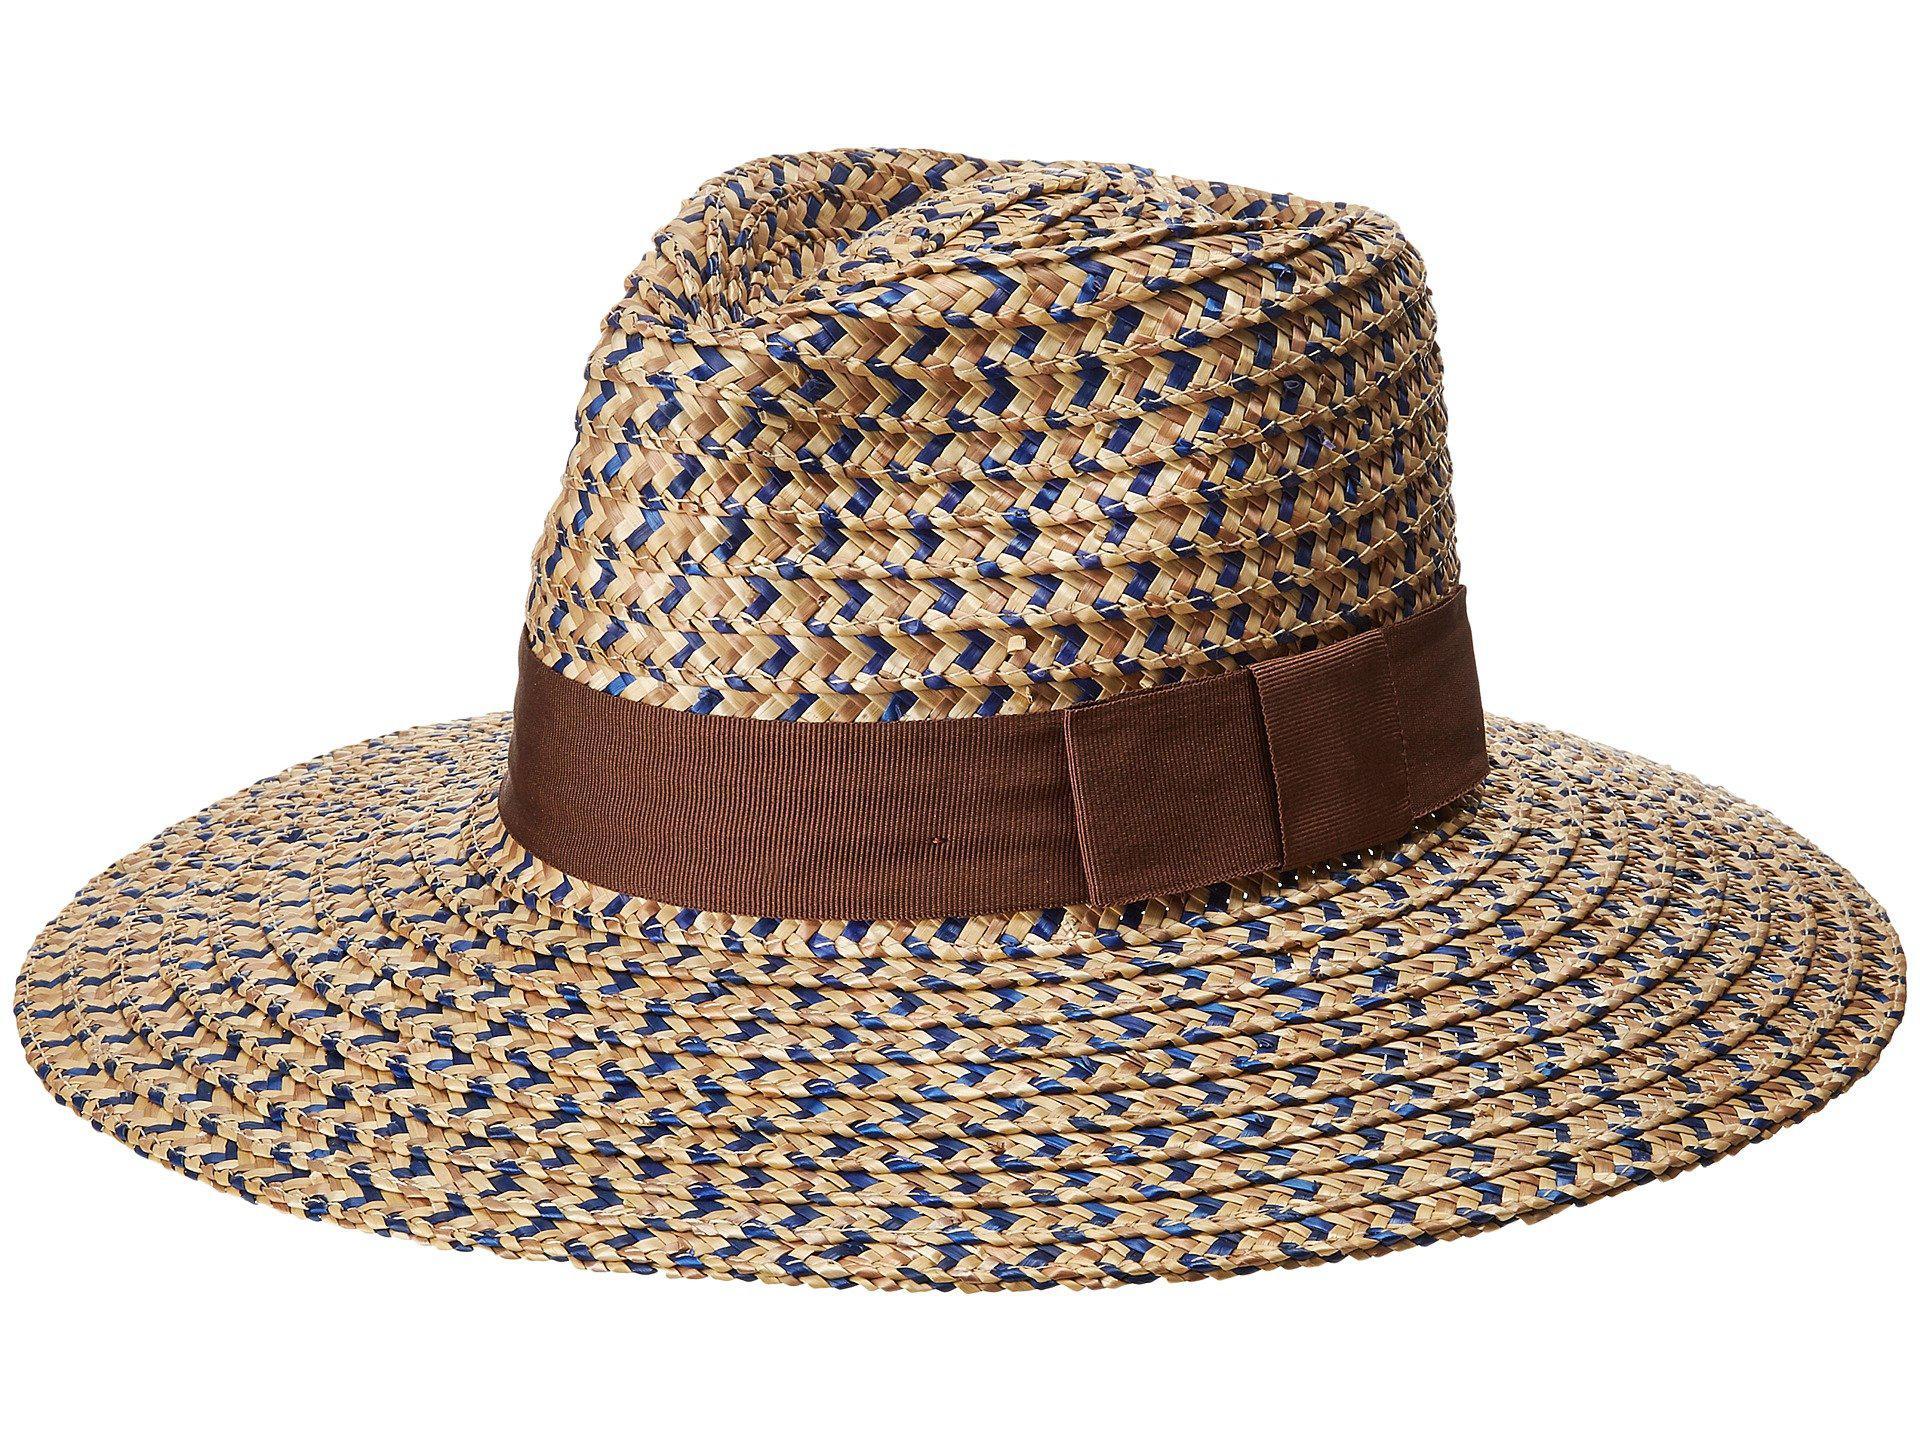 6c3039e5b02 Lyst - Brixton Joanna Hat (bronze olive tan) Caps in Brown